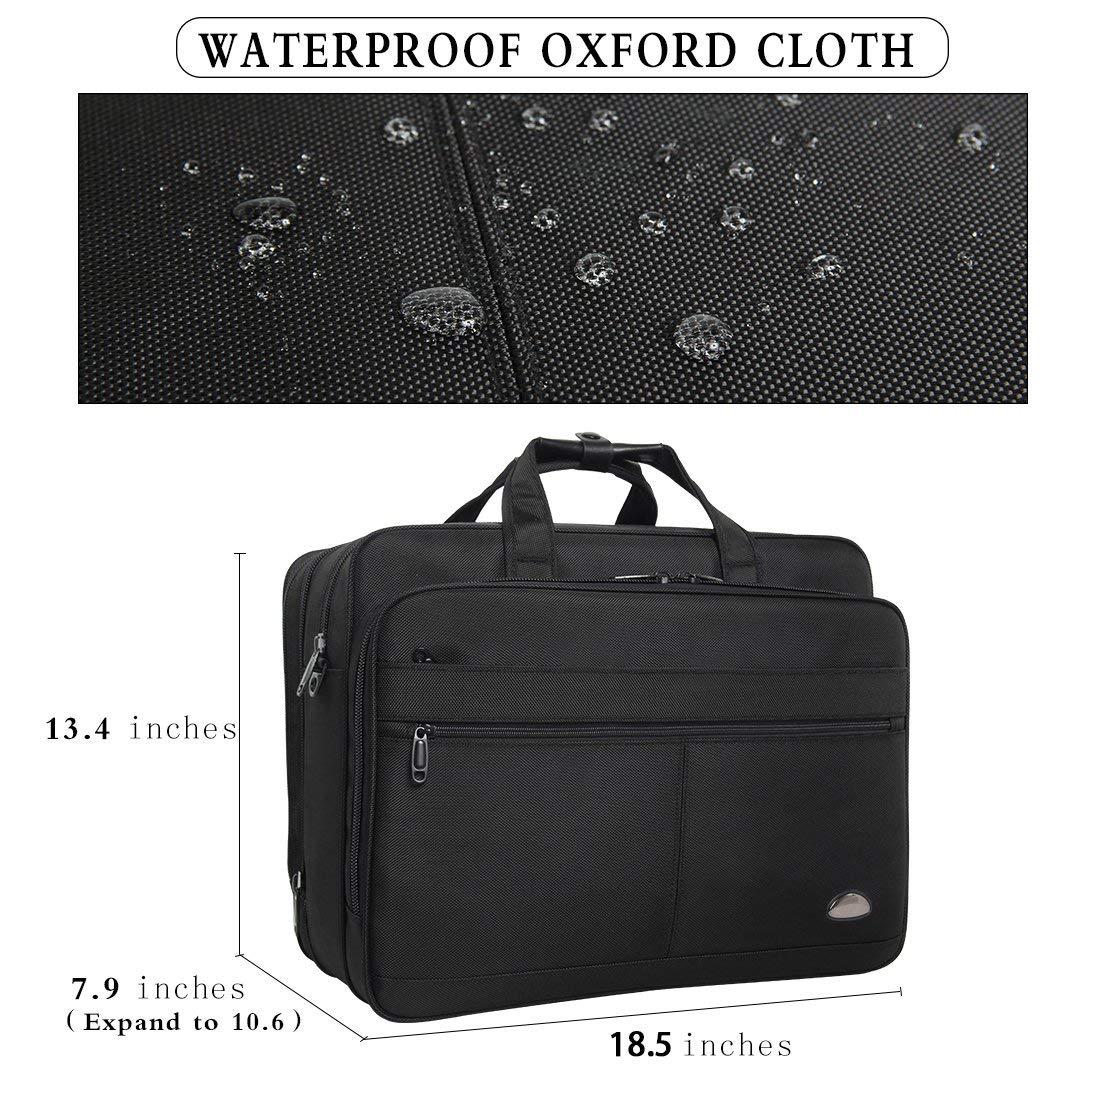 18-18.5 inch Laptop Bag,Water Resisatant Business Laptop Briefcase,Expandable High Capacity Shoulder Bag,Nylon Multi-Functional Shoulder Messenger Bag for Men Fits 17.3 inch Loptop,Computer,Tablet by LYALPH (Image #2)